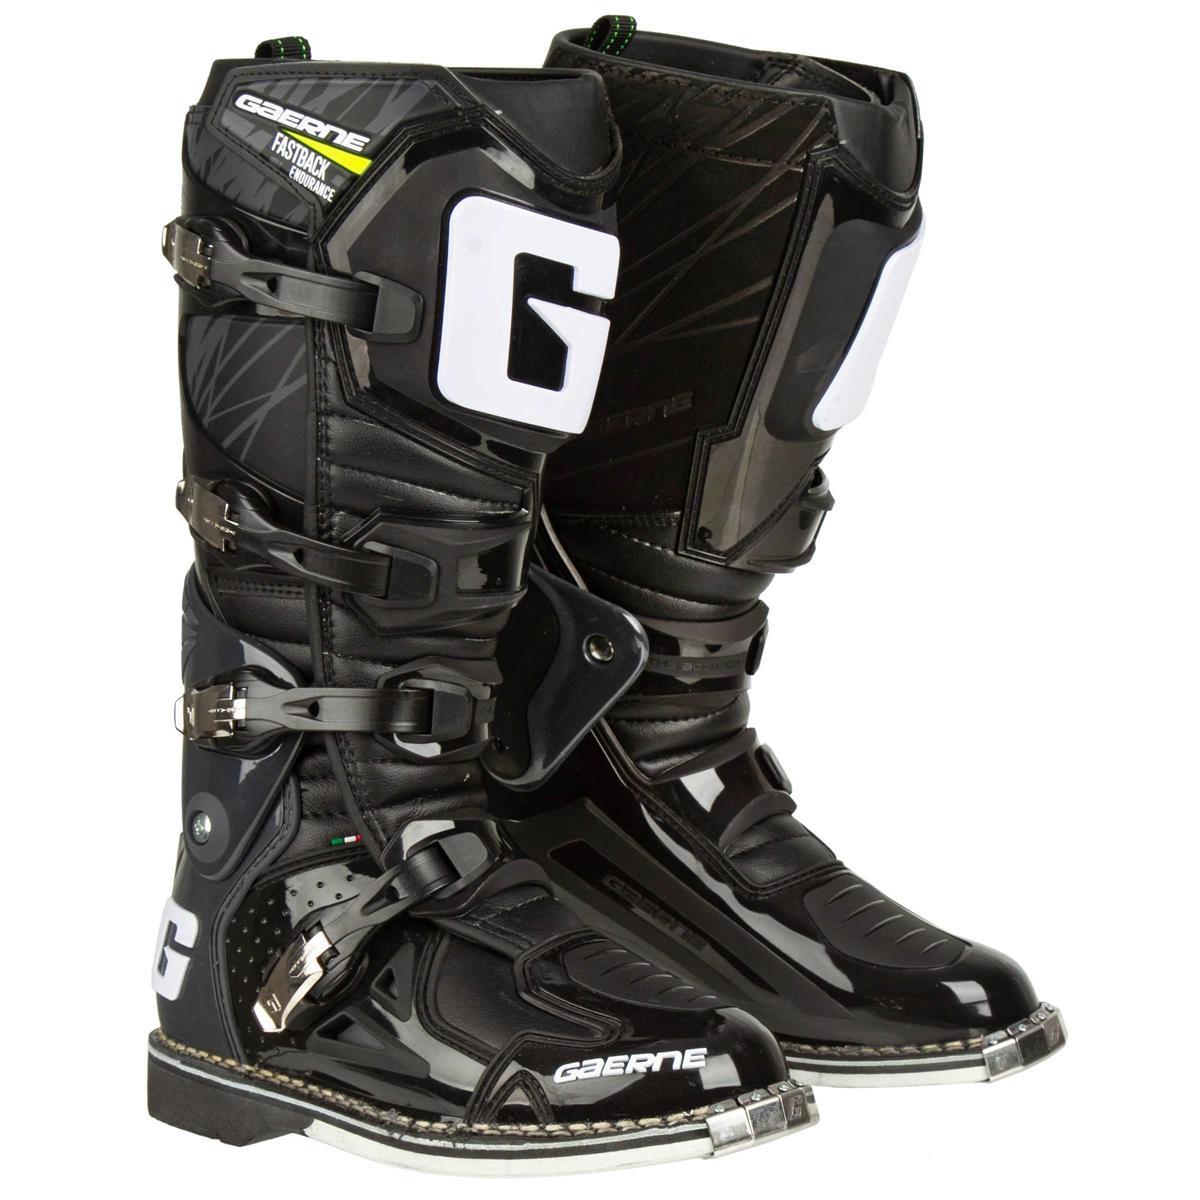 Gaerne Motocross-Stiefel Fastback Endurance Schwarz